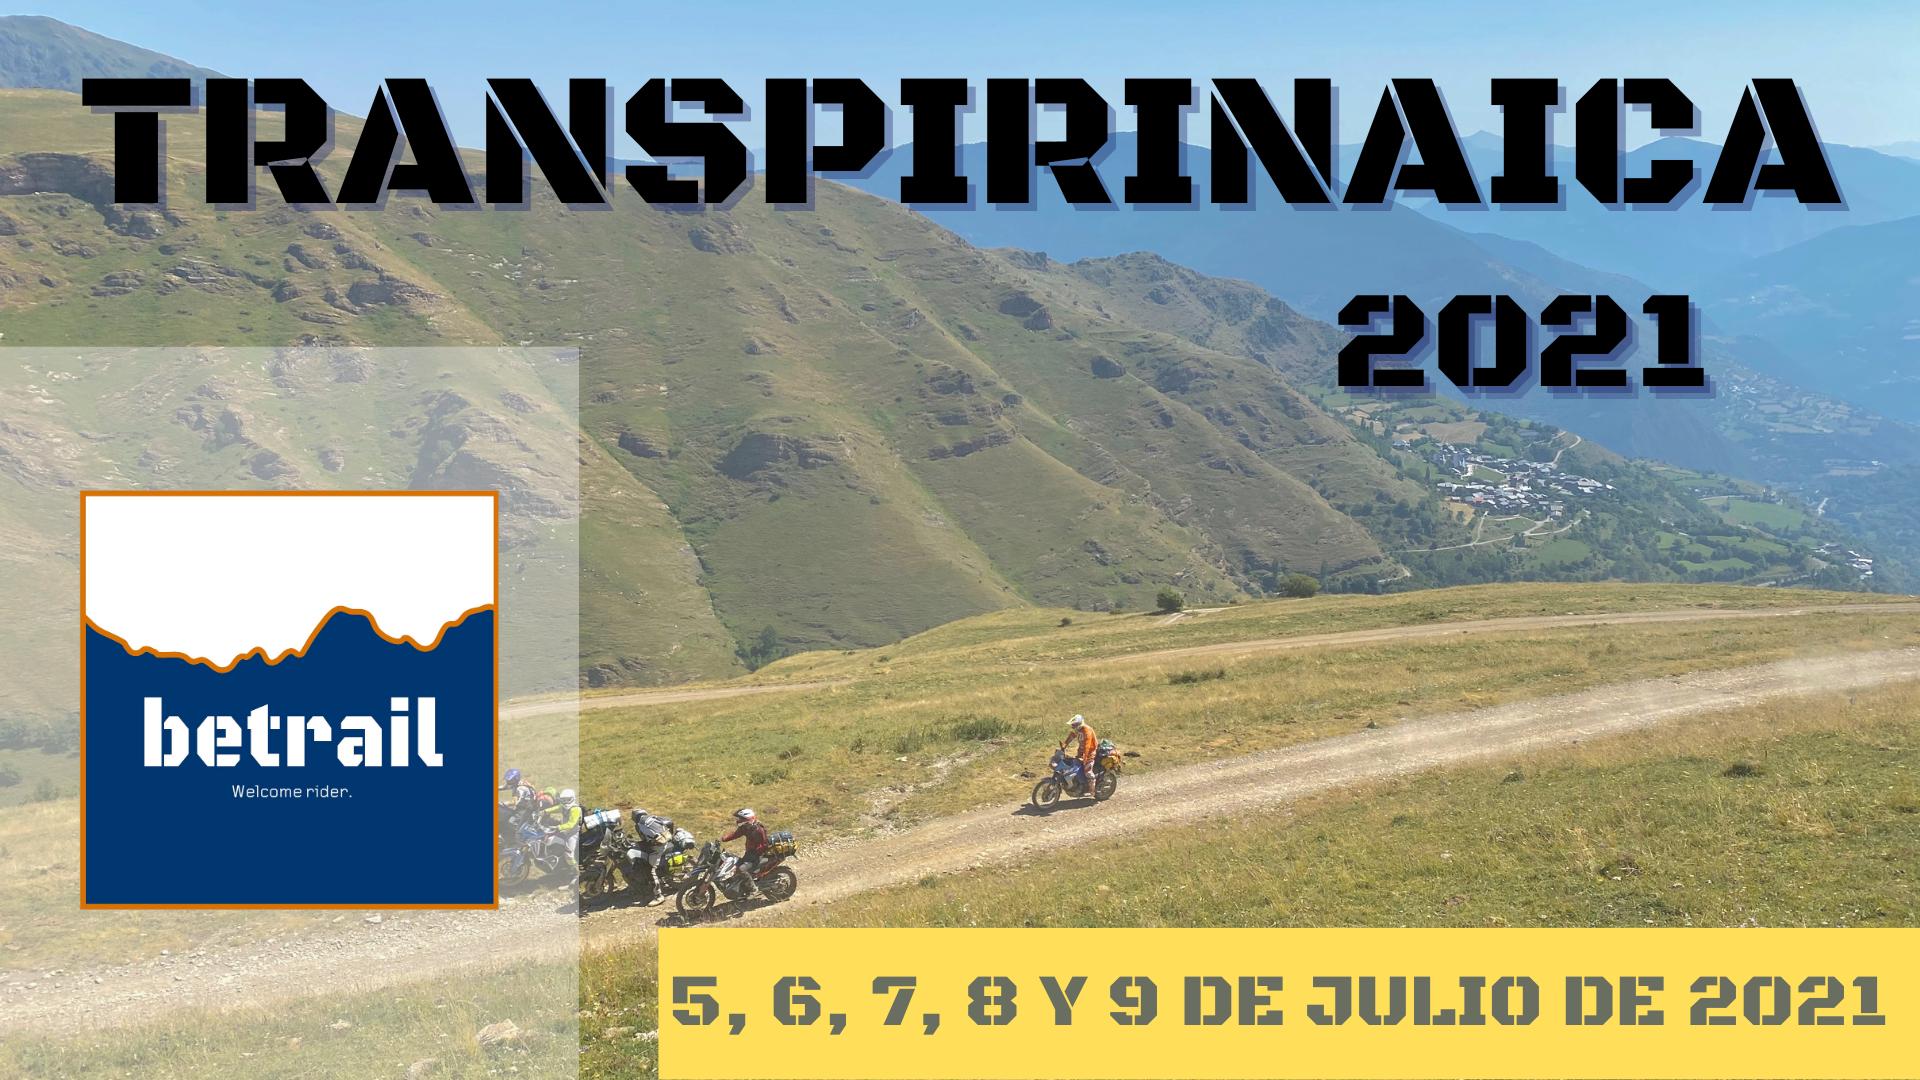 Ruta Transpirinaica 2021 - betrail moto